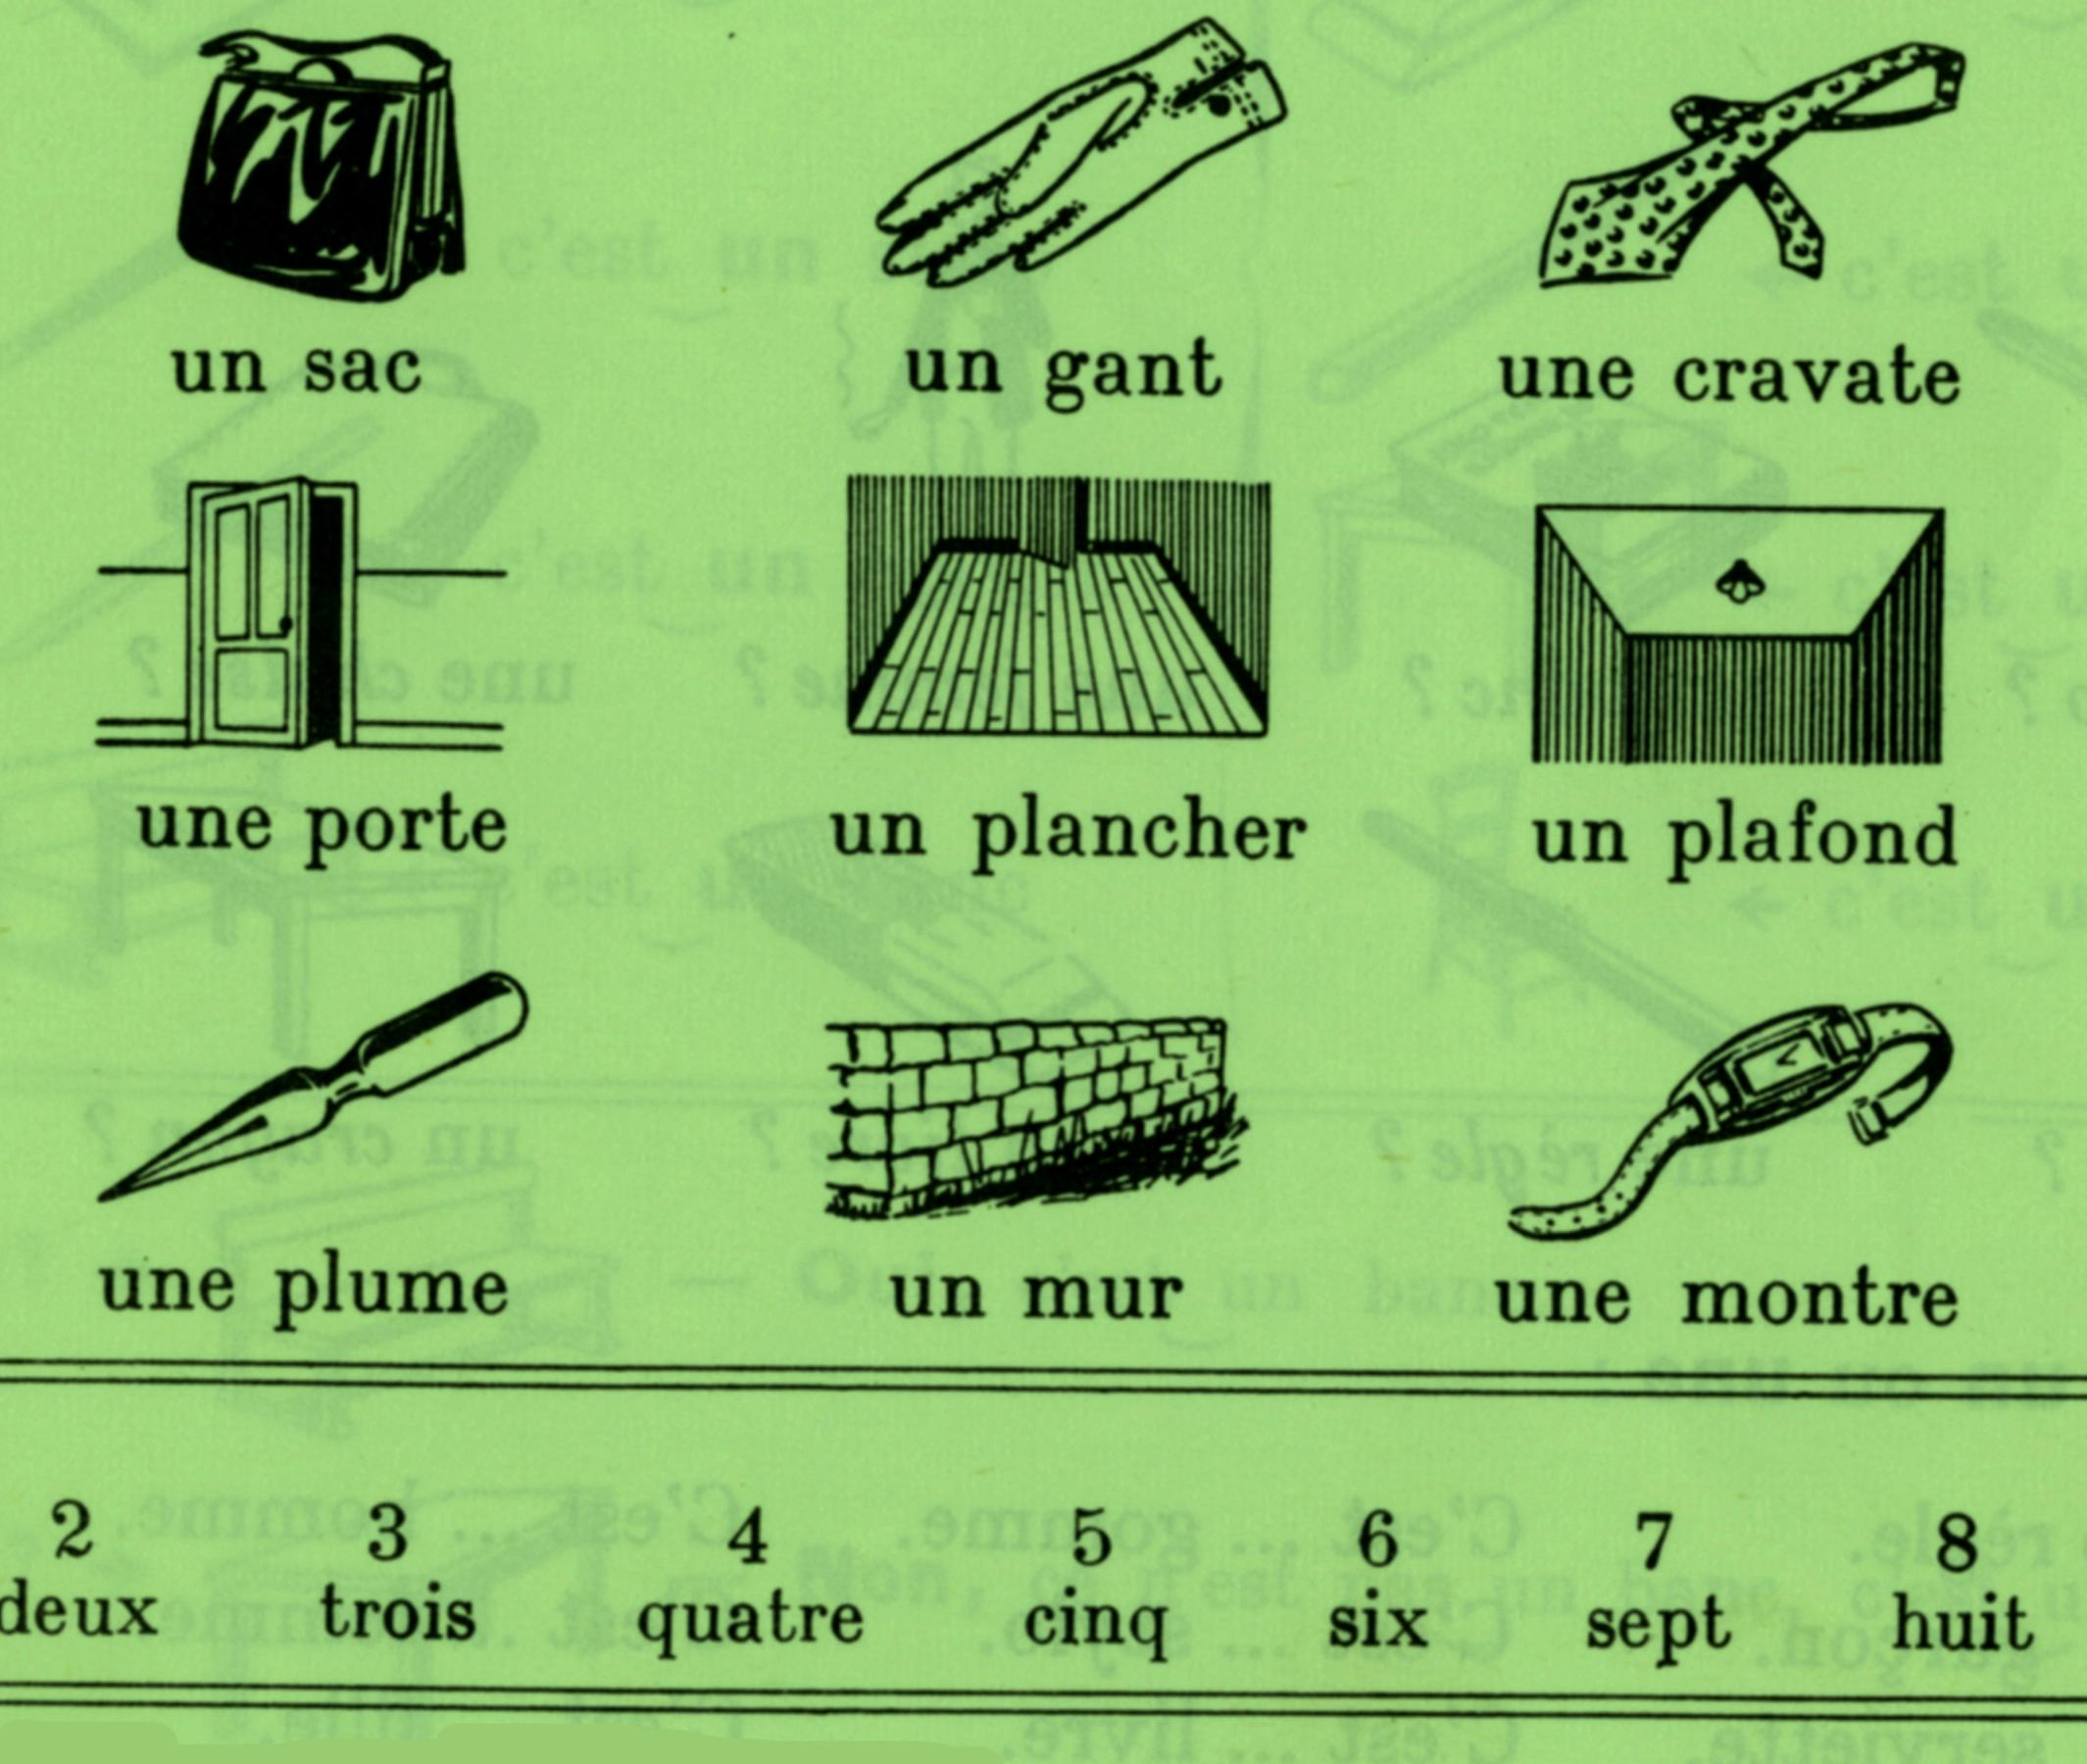 A straightforward gridded presentation of French vocabulary words. Uncredited illustration from  cours de la langue et la civilisation Françaises I , Librairie Hachette, 1953.